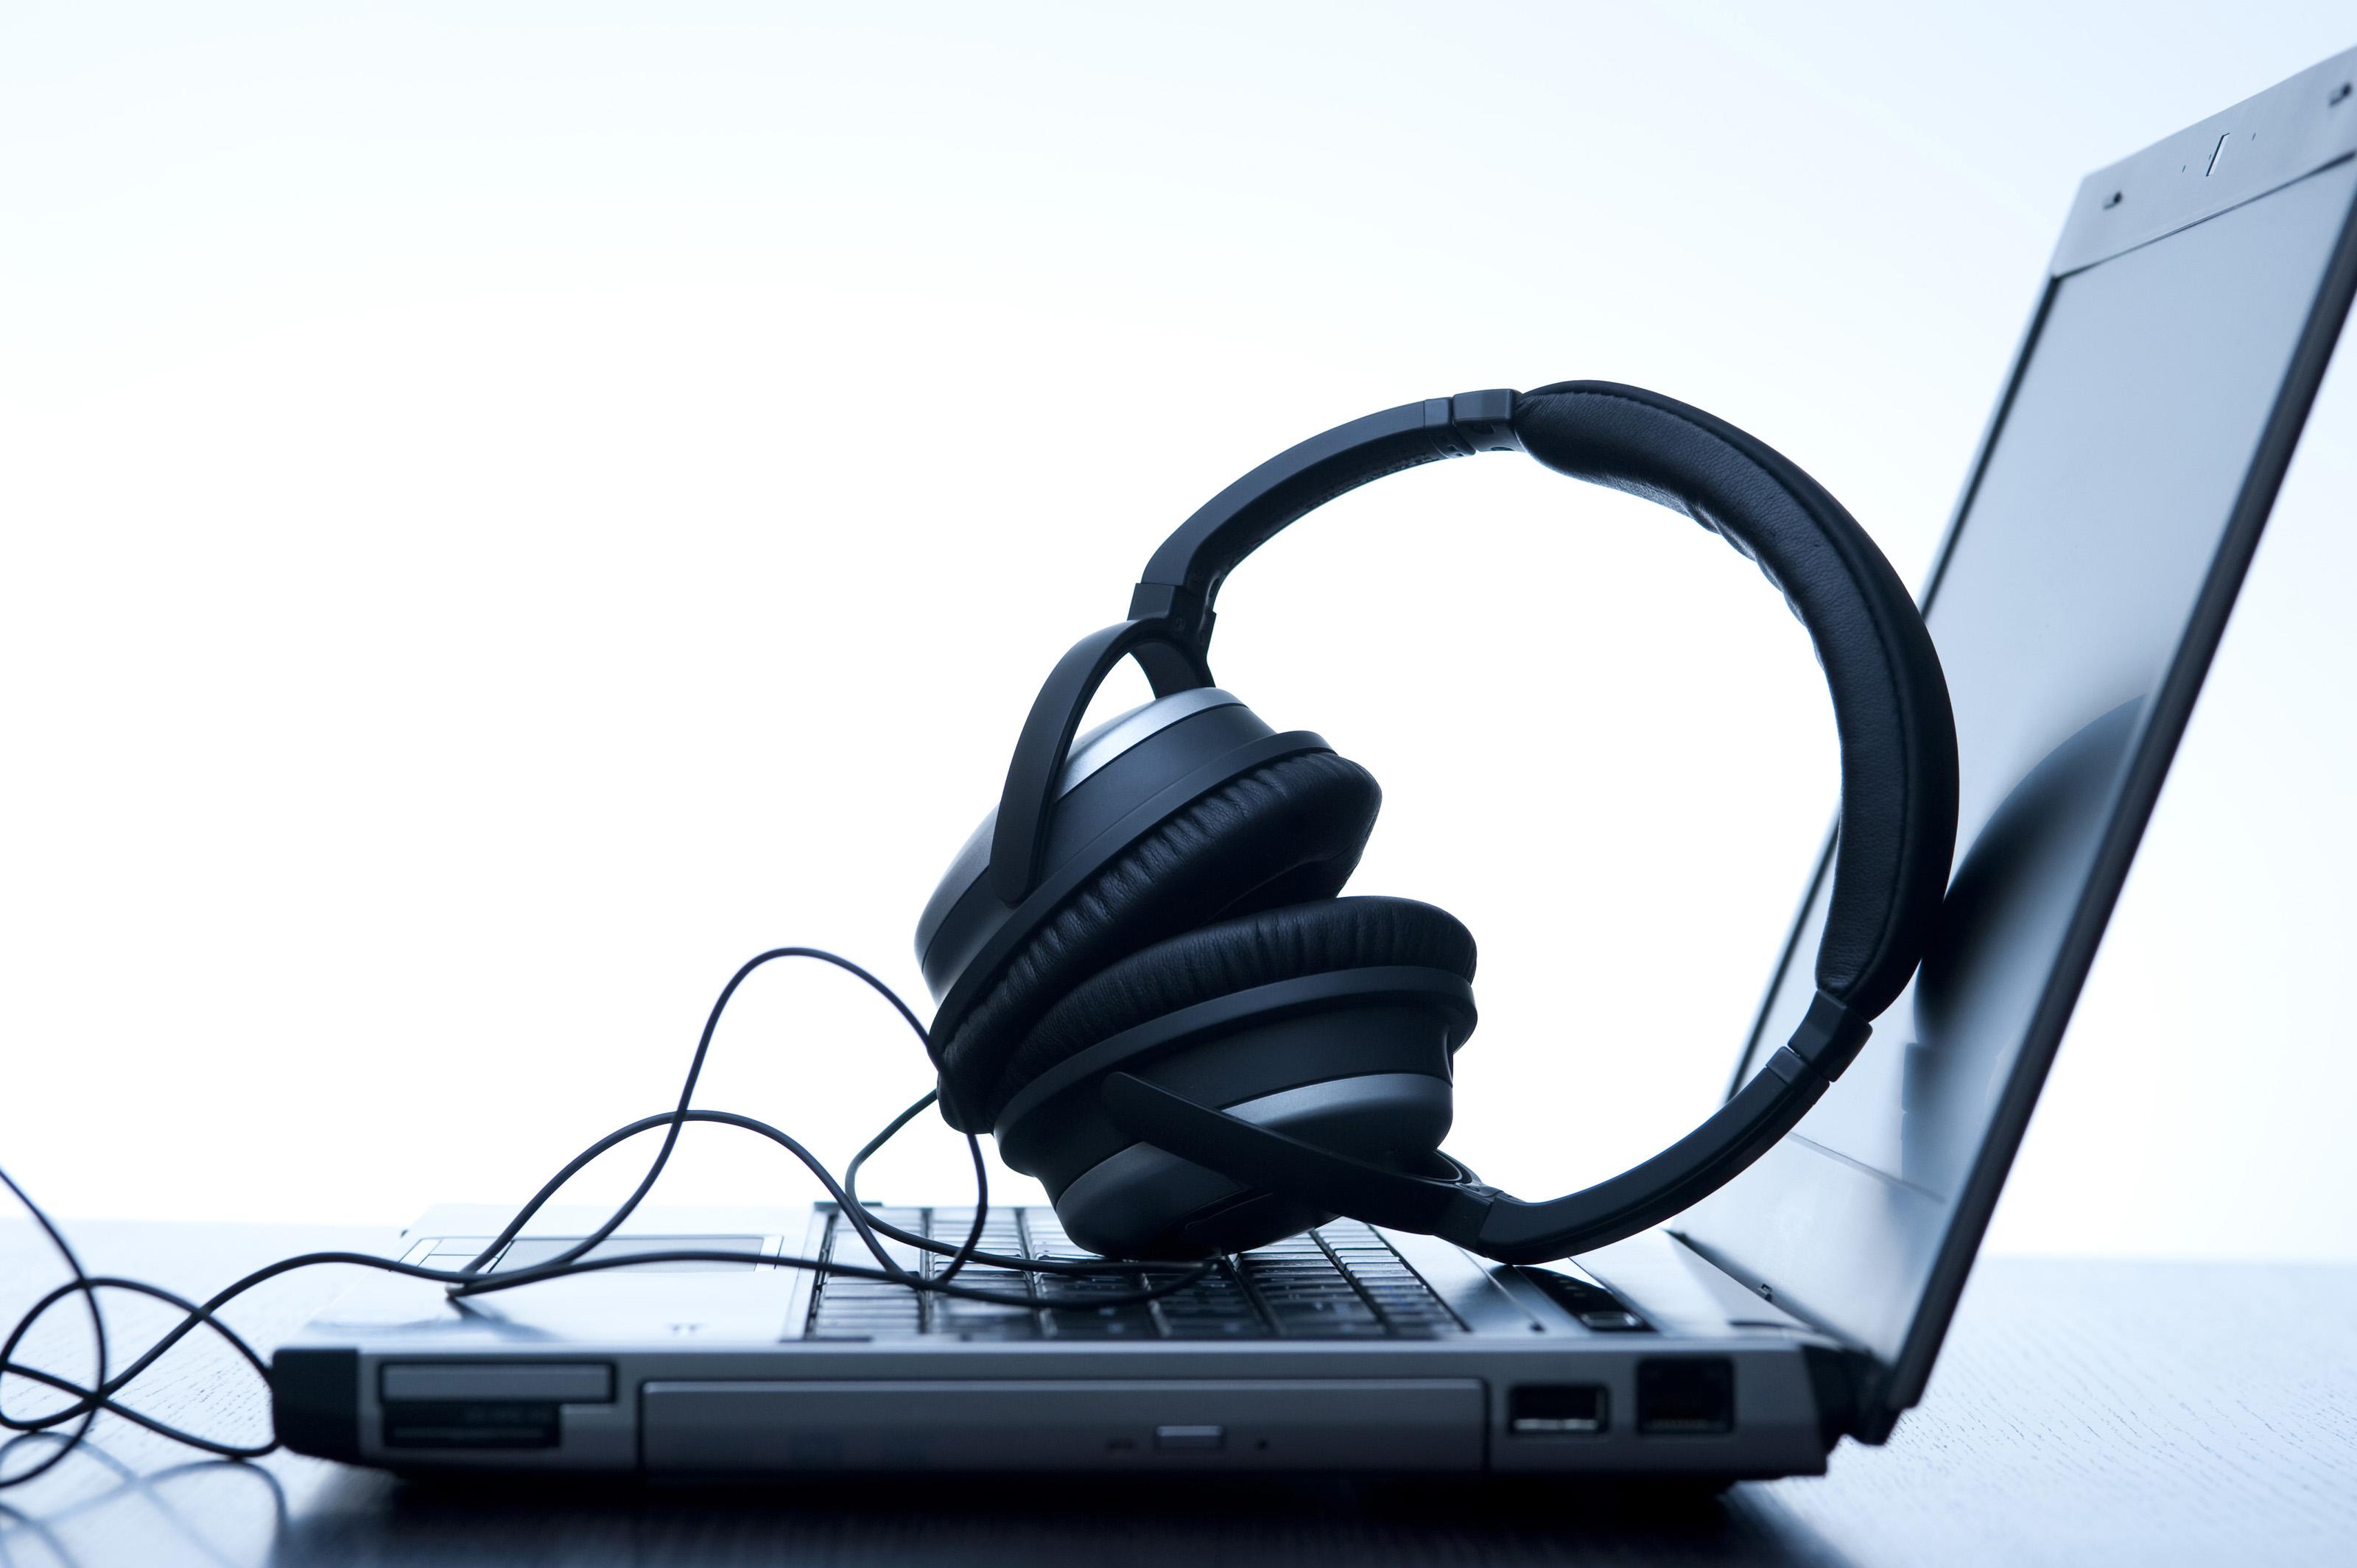 Video treatments as info lit